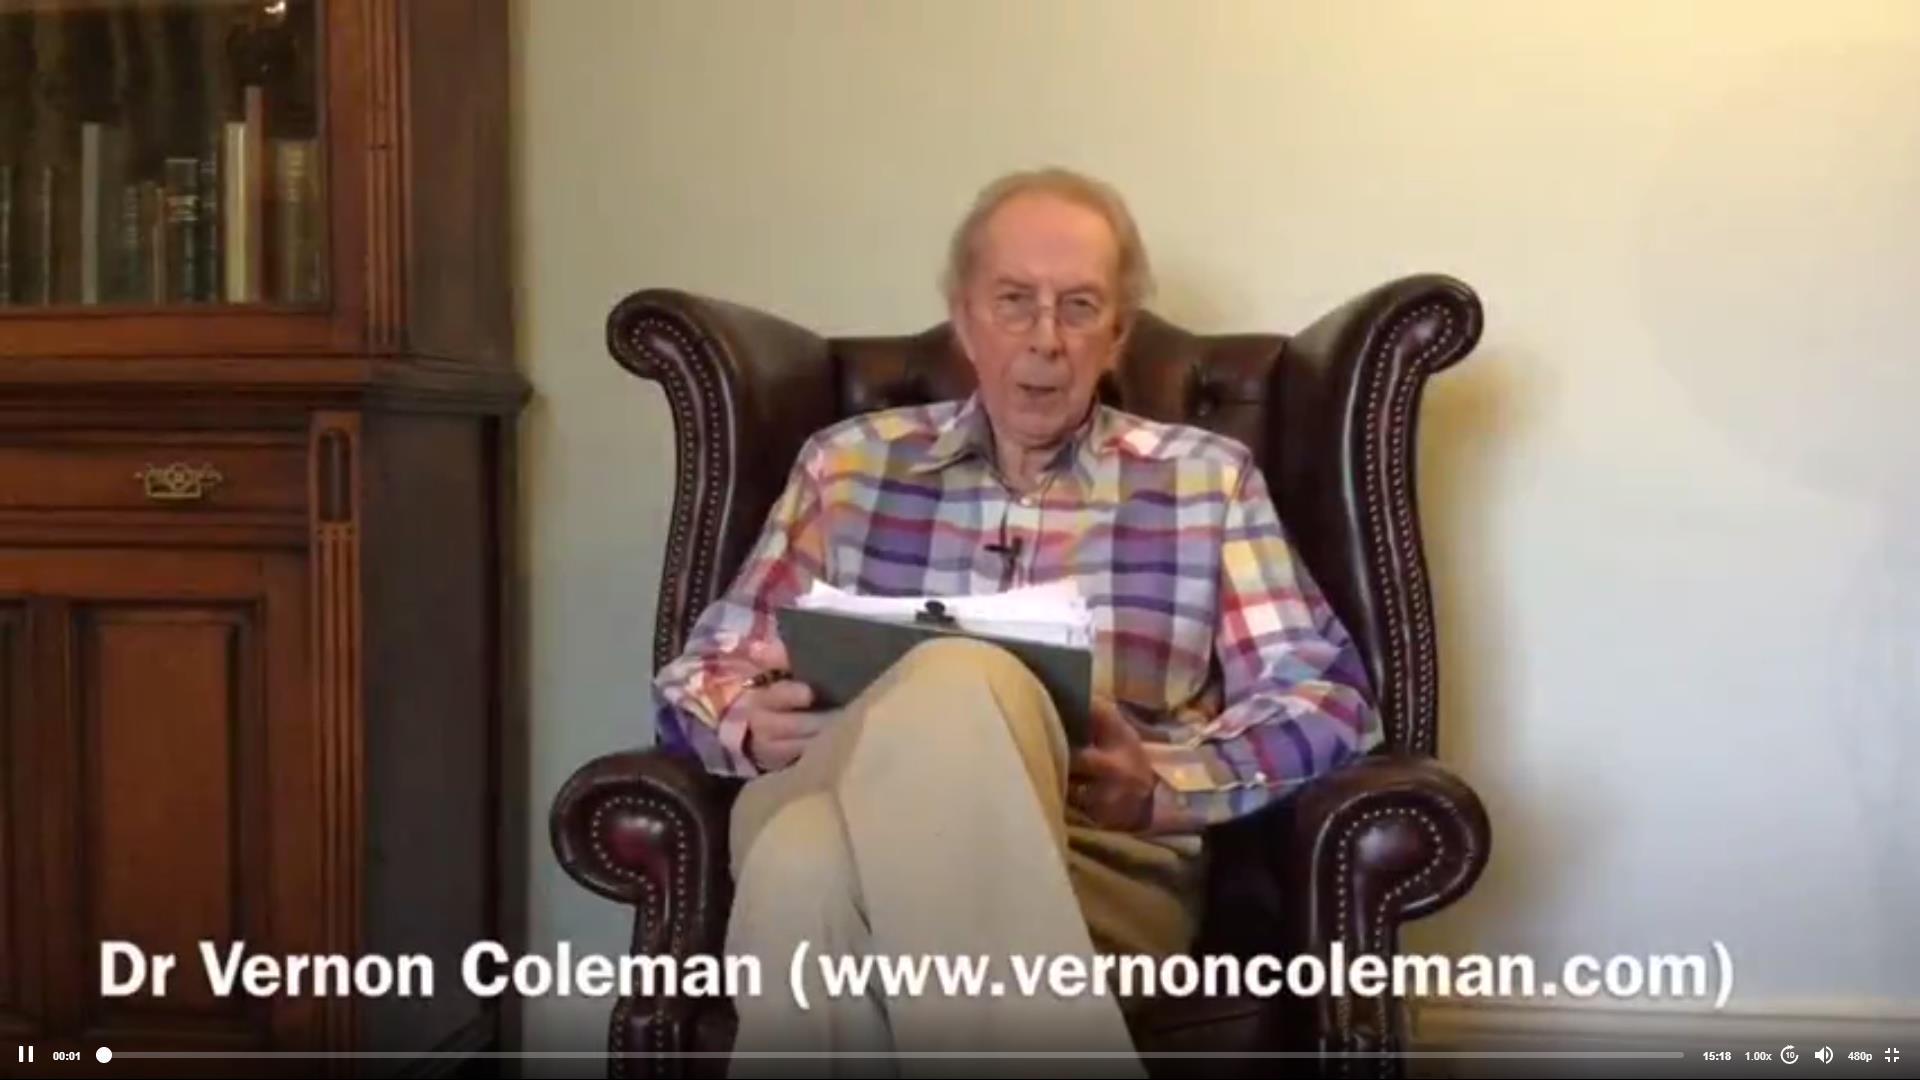 Dr Vernon Coleman MB ChB DSc FRSA